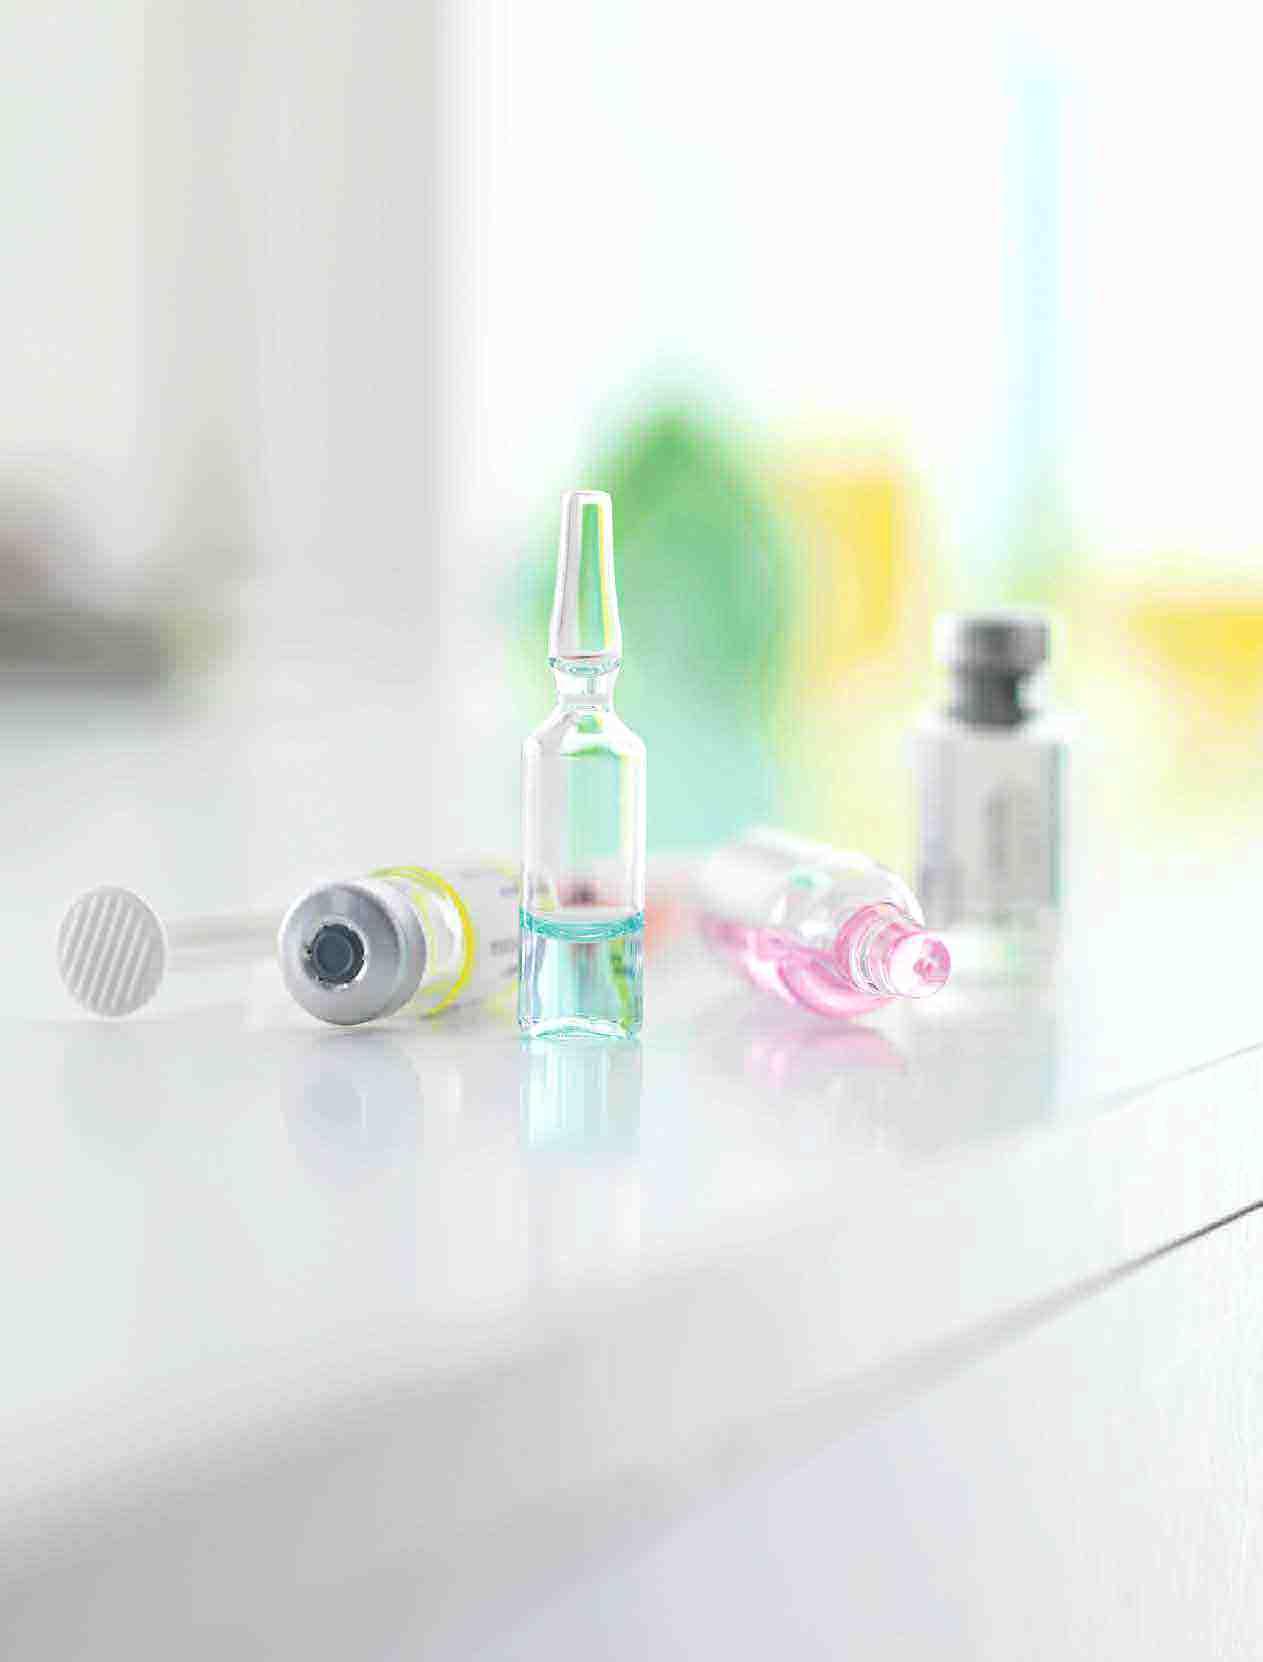 The Battle Against Bacteria